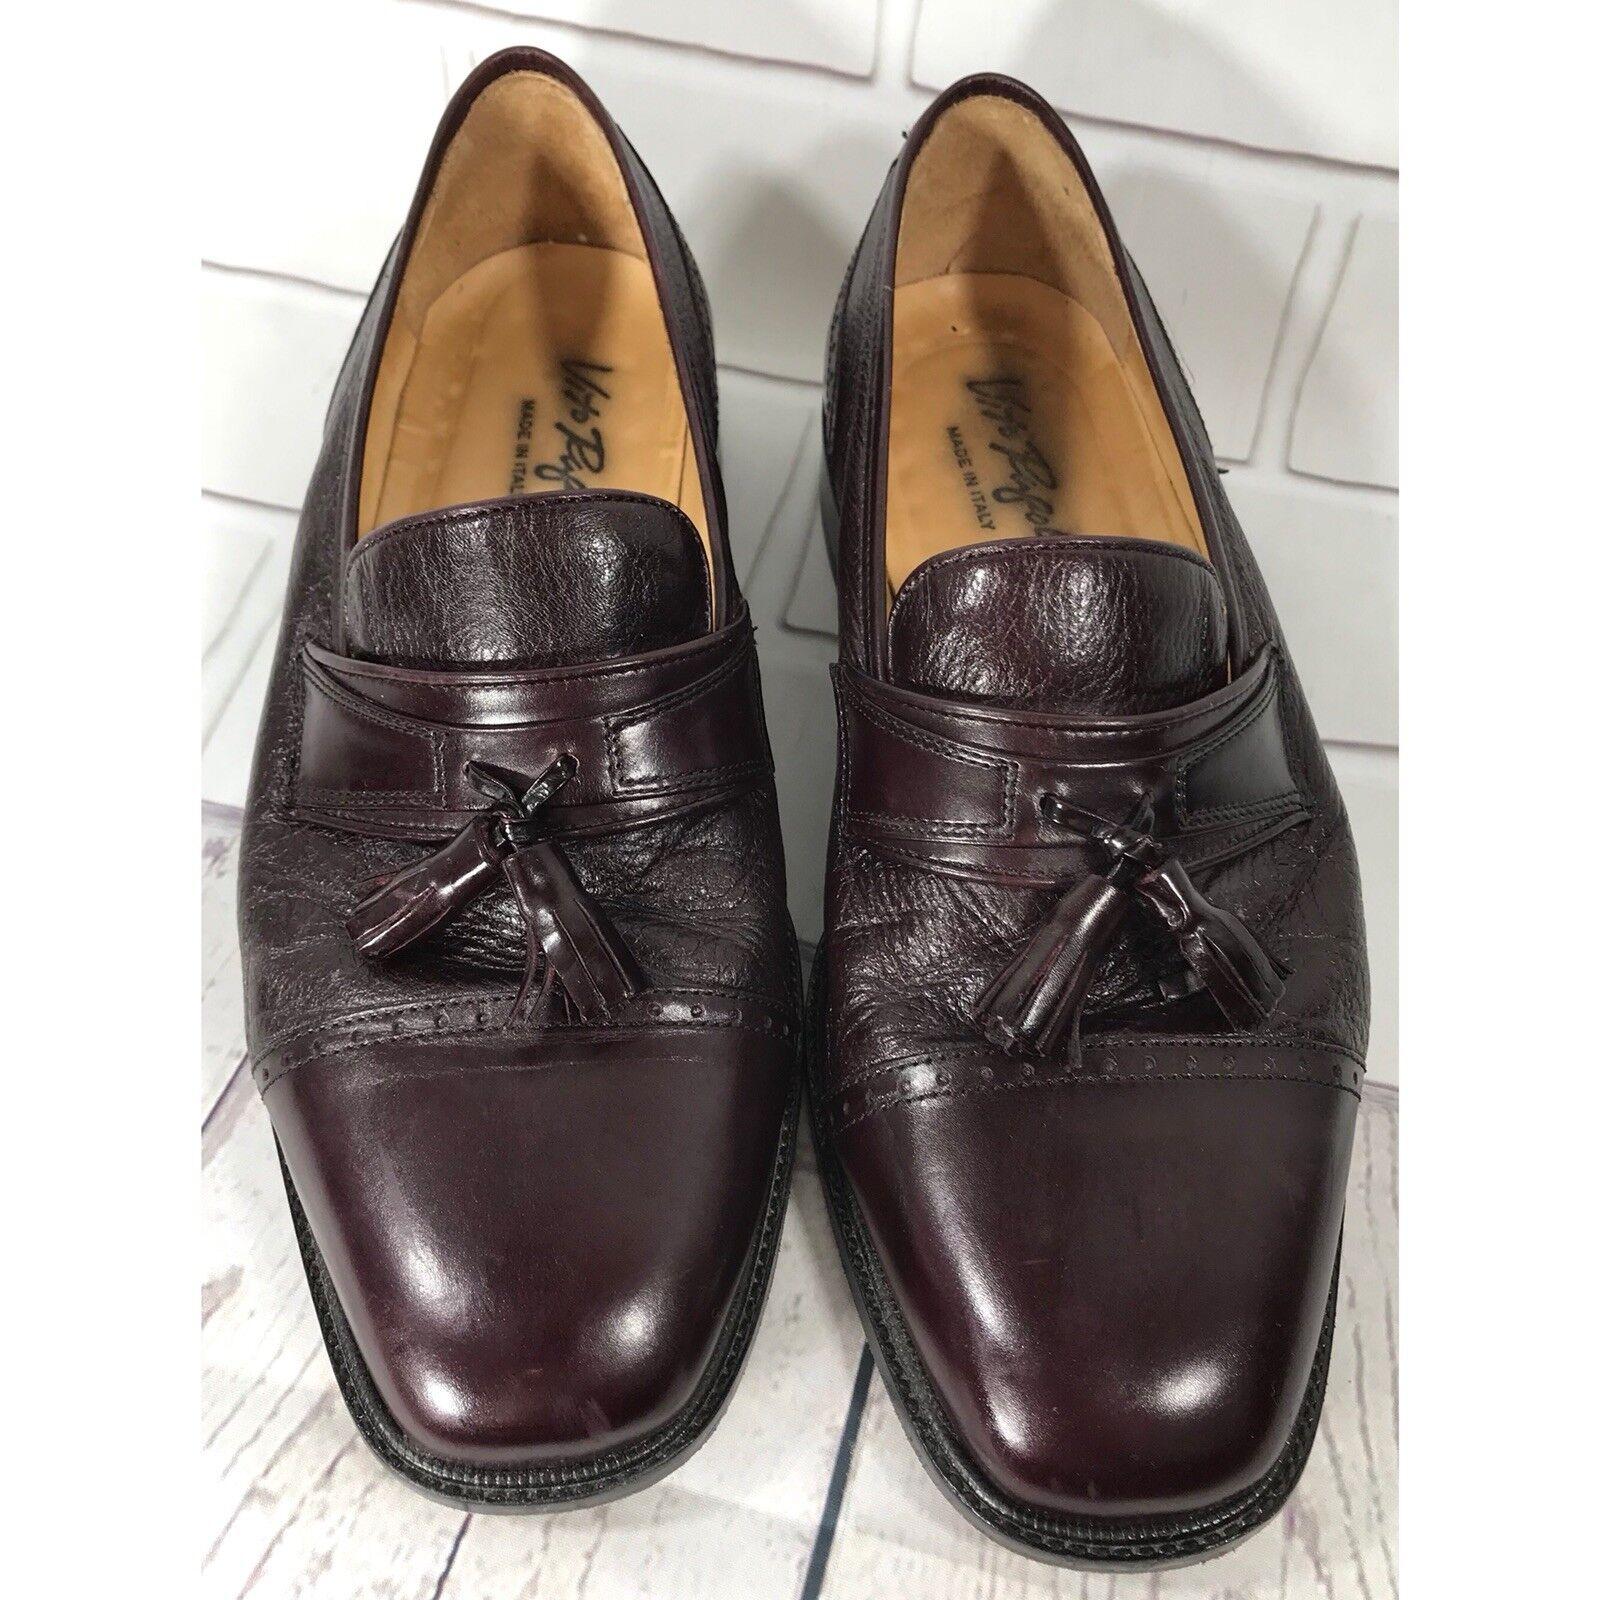 Vito Rufolo Men's Burgundy Leather Tassel Loafers Slip On schuhe schuhe schuhe Größe 9.5 W  5214d0